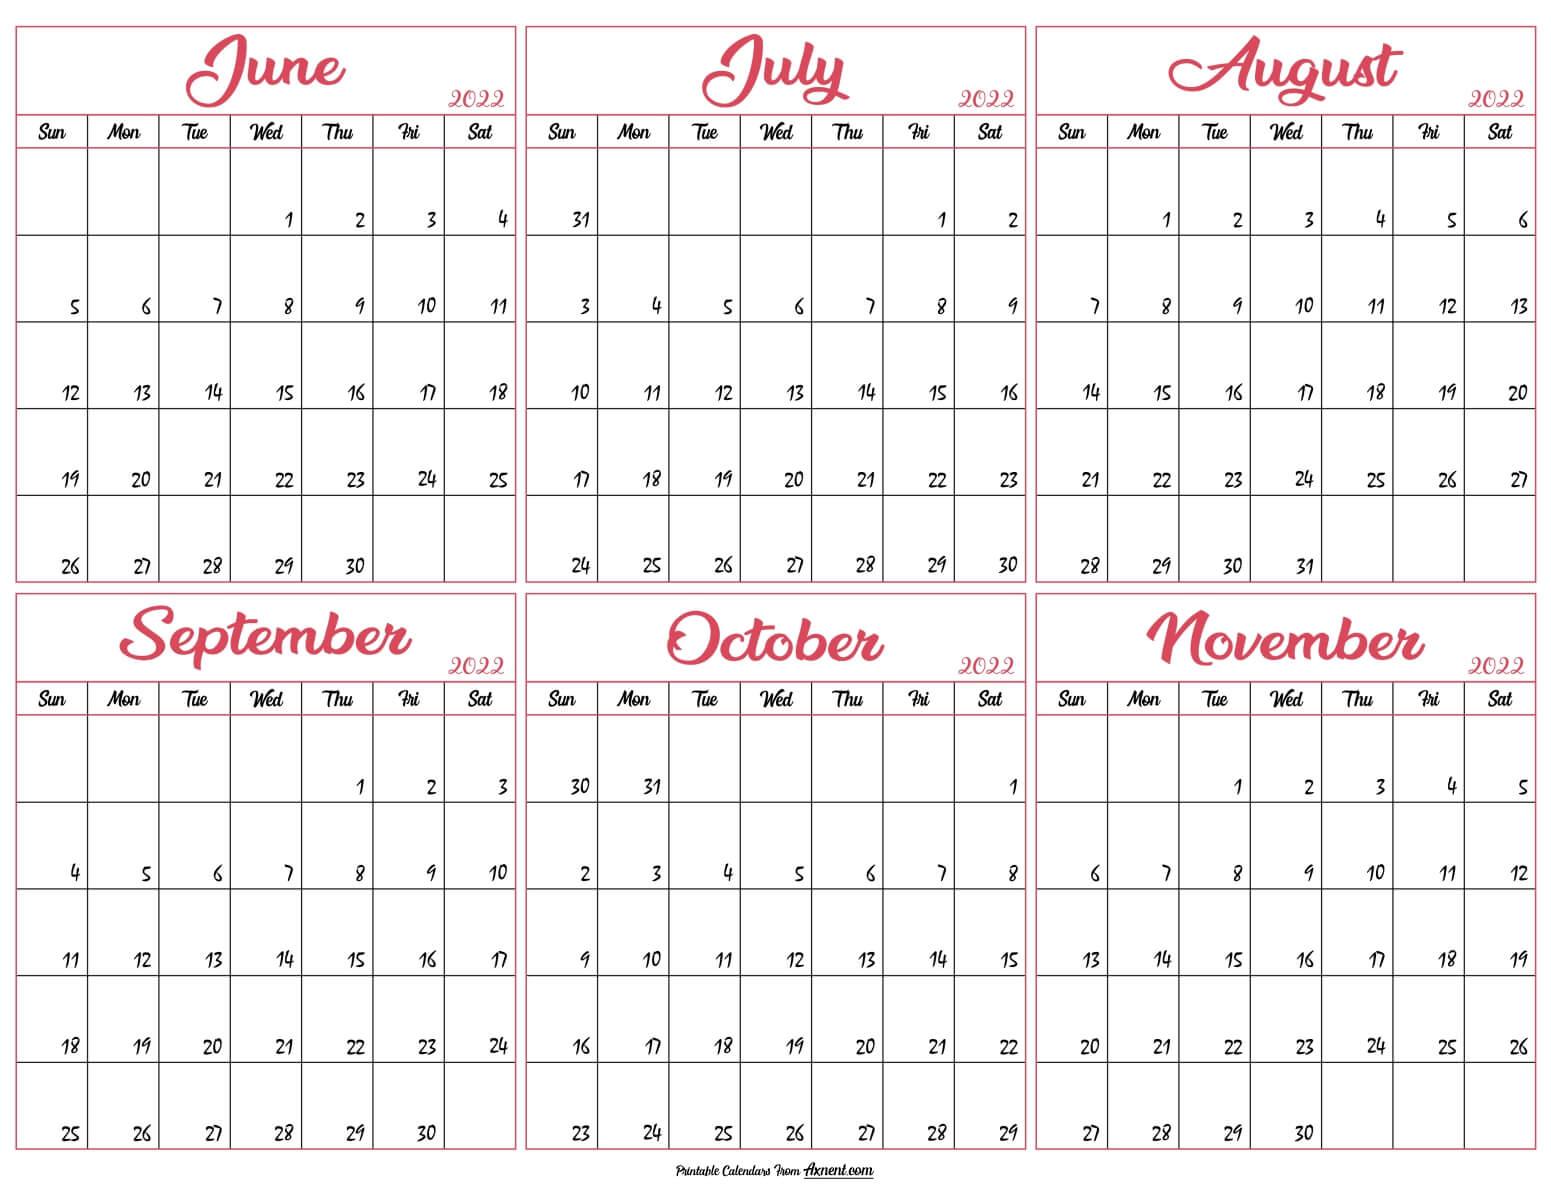 June to November Calendar 2022